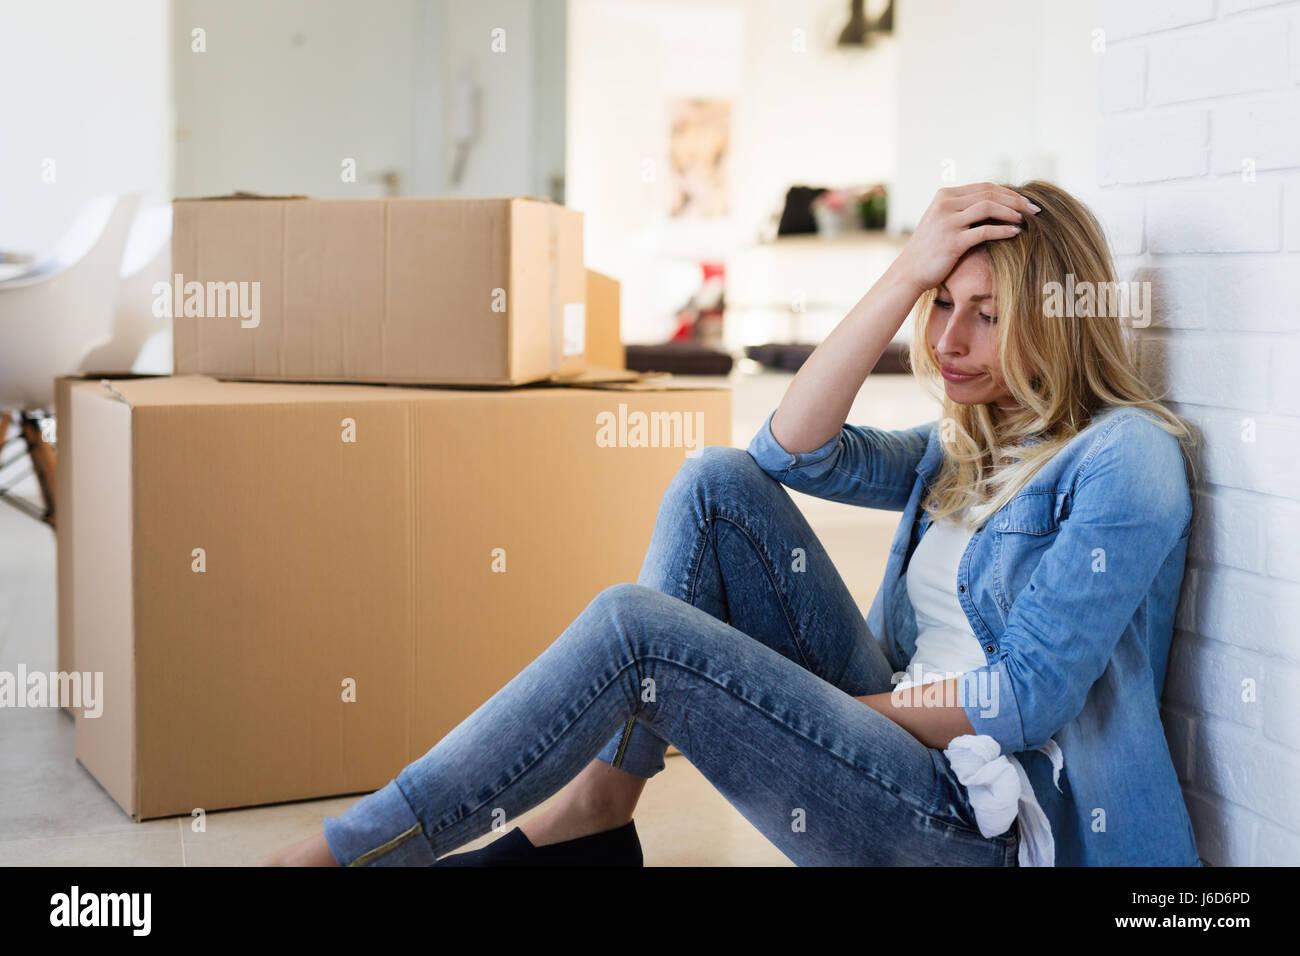 Tired woman épuisé alors que moving into new home Photo Stock